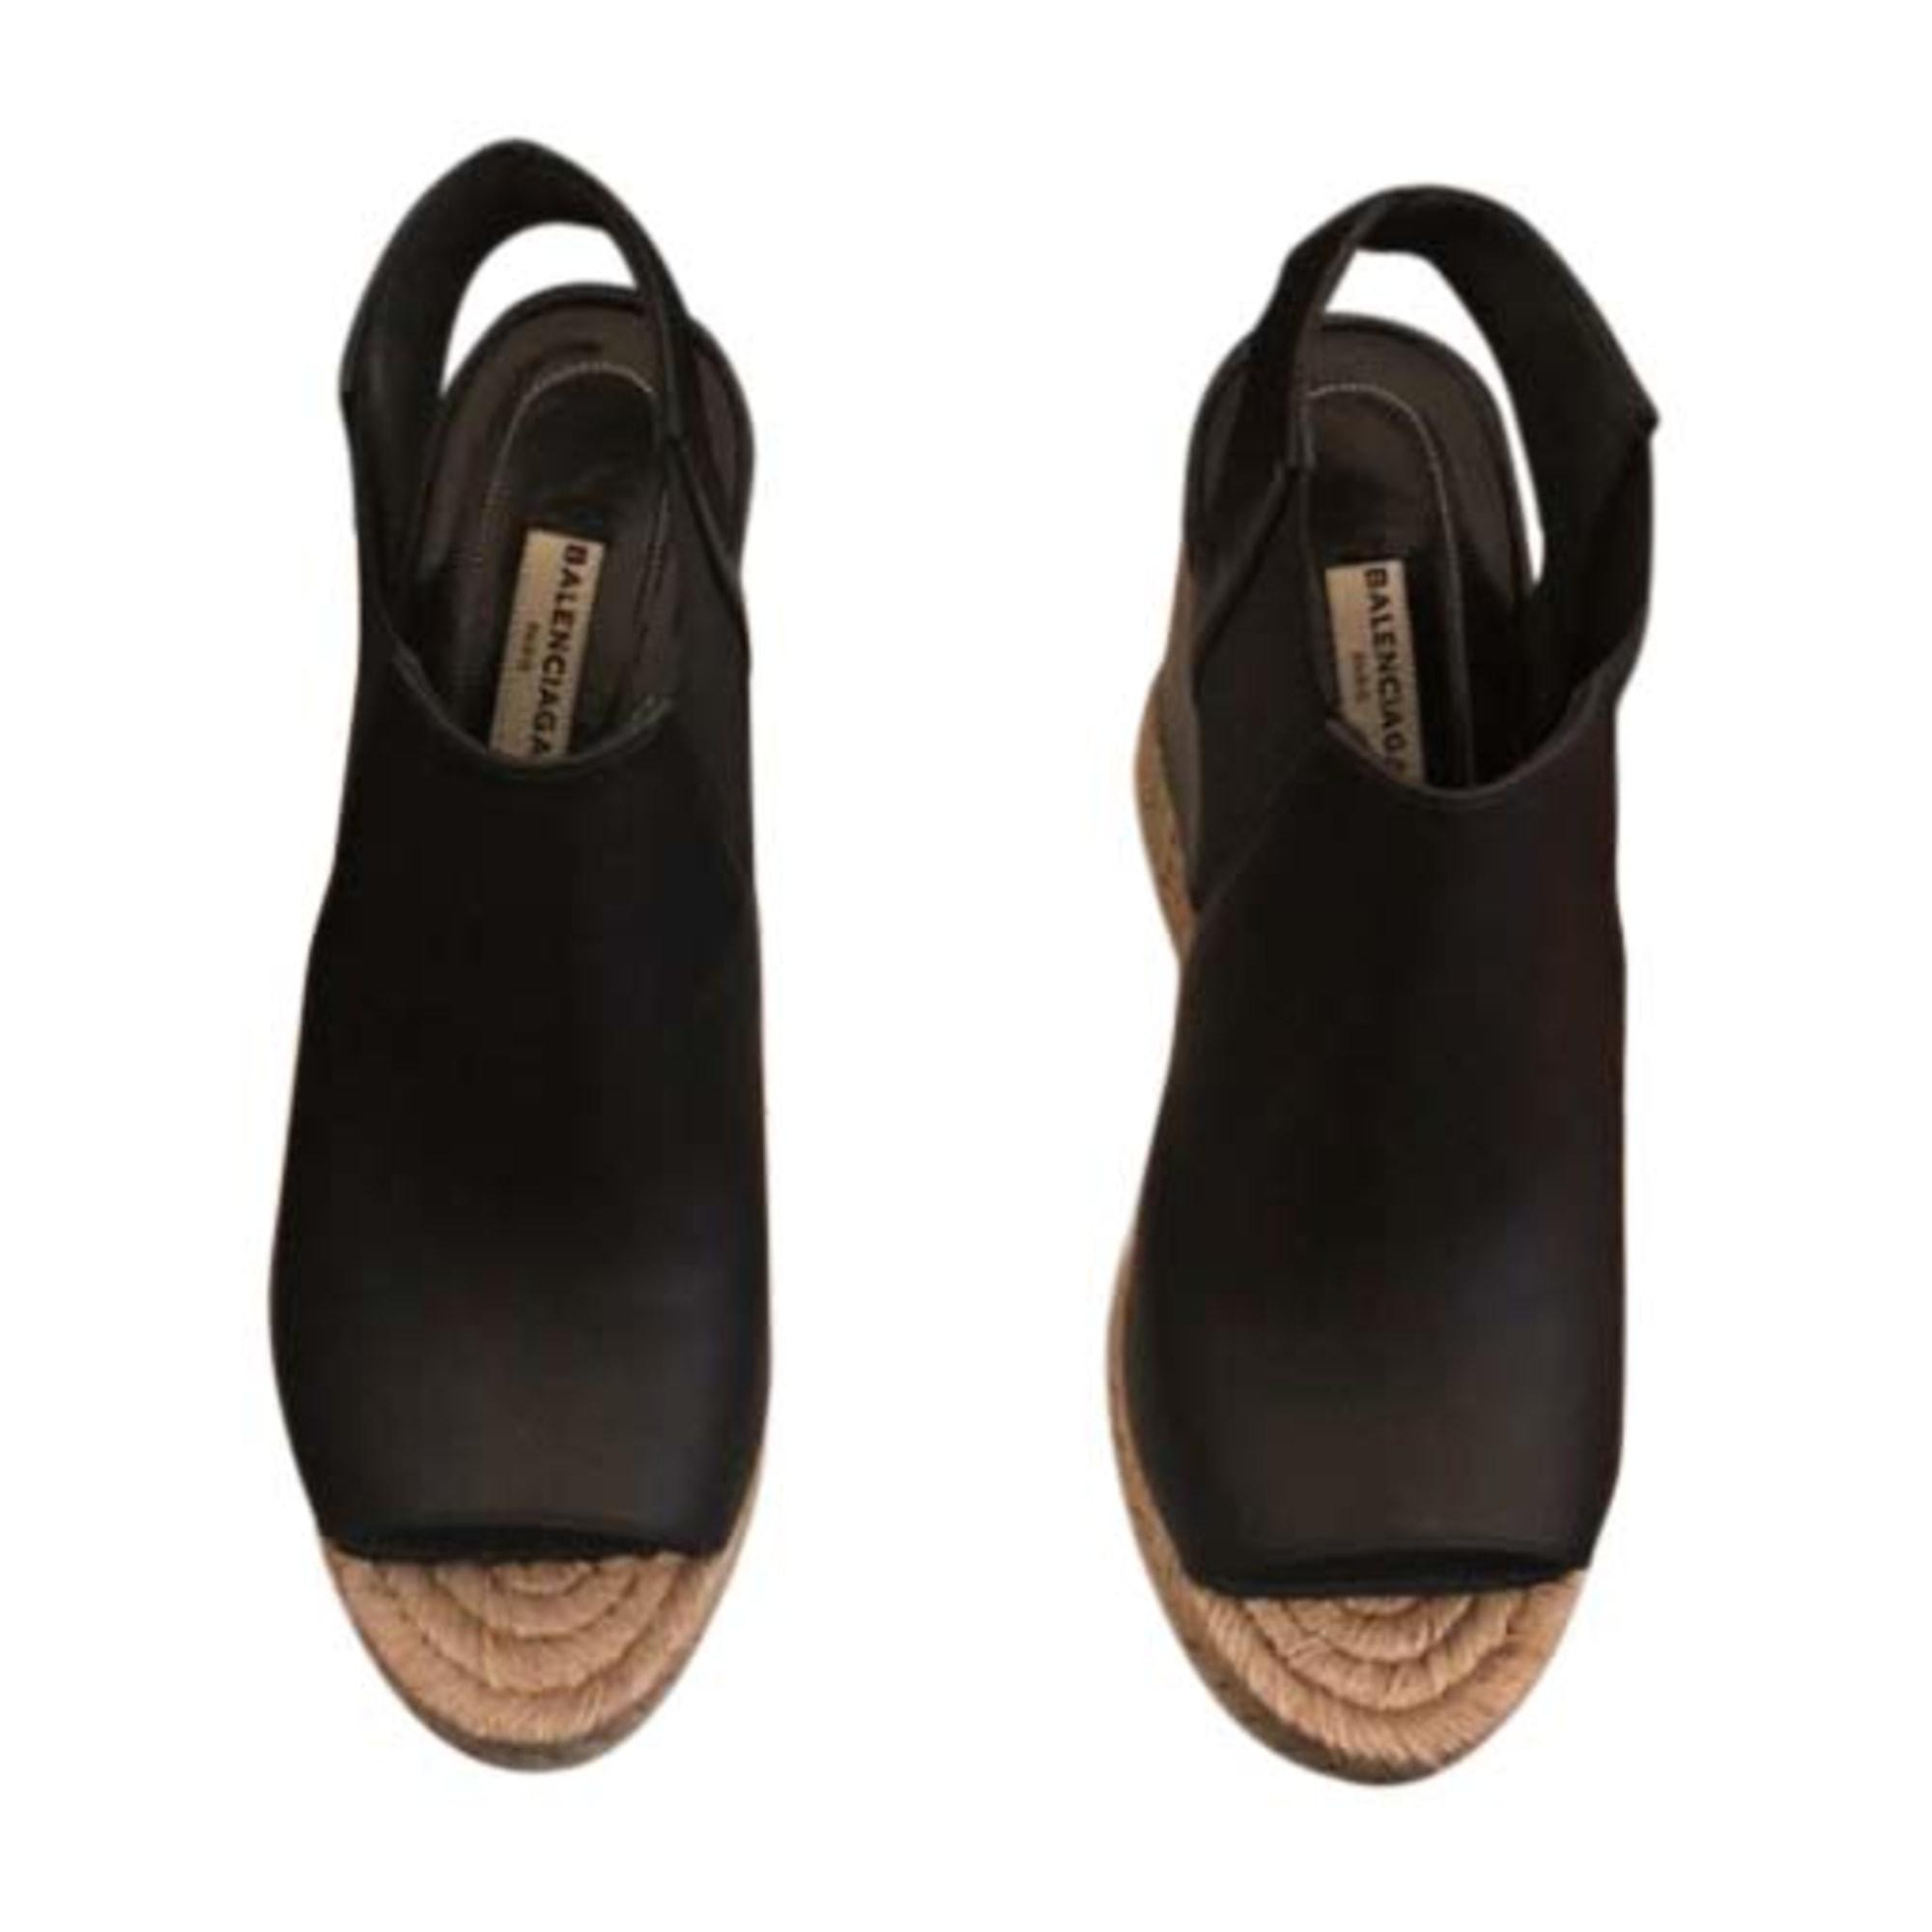 Sandales compensées BALENCIAGA Noir